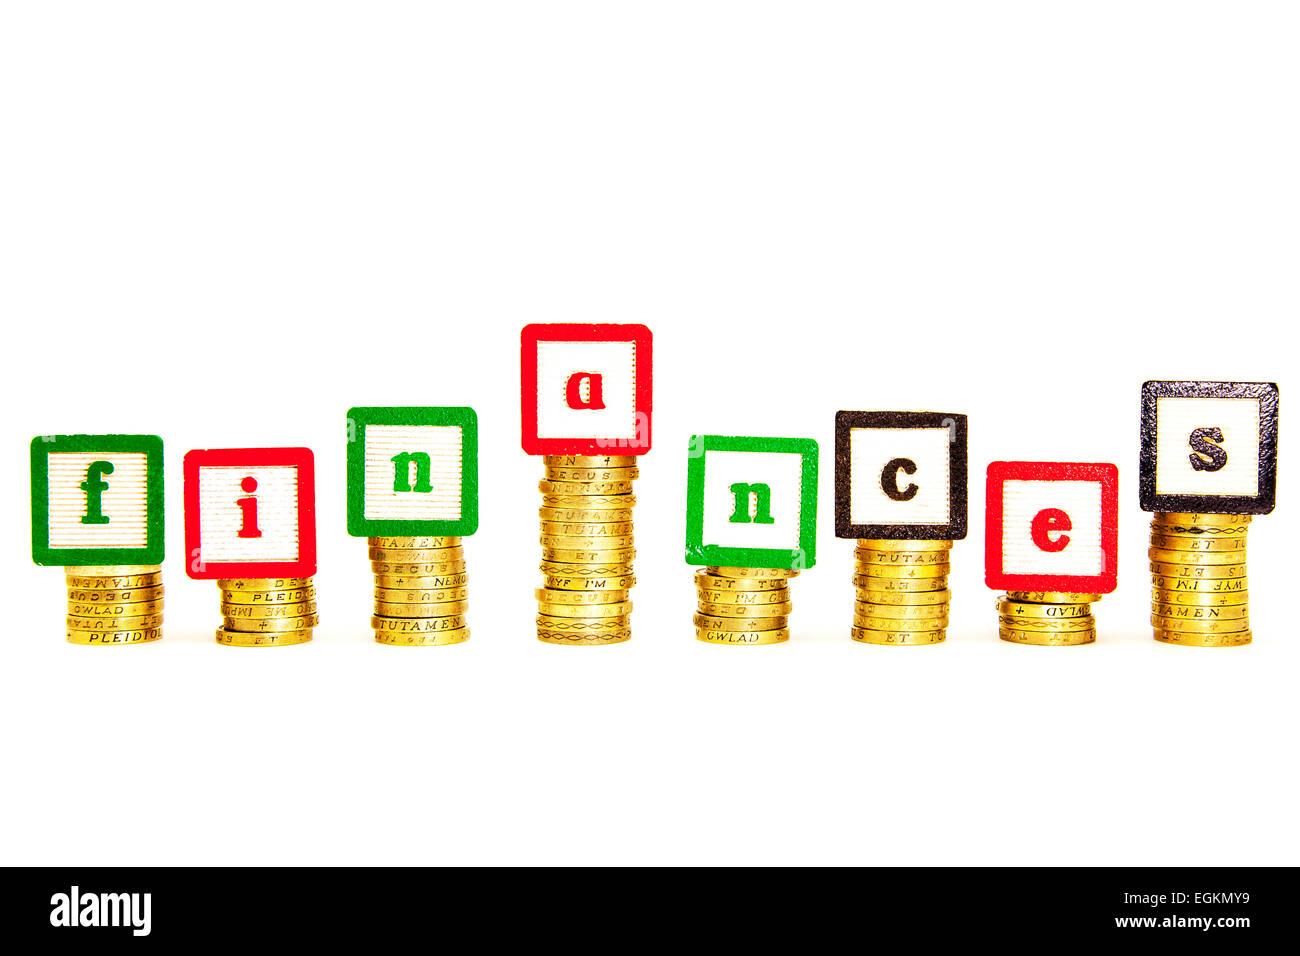 Finanzen Finanzierung Geld Probleme Cash Fonds Fonds Finanzkredite Pfund Ausschnitt ausschneiden textfreiraum weißen Stockbild